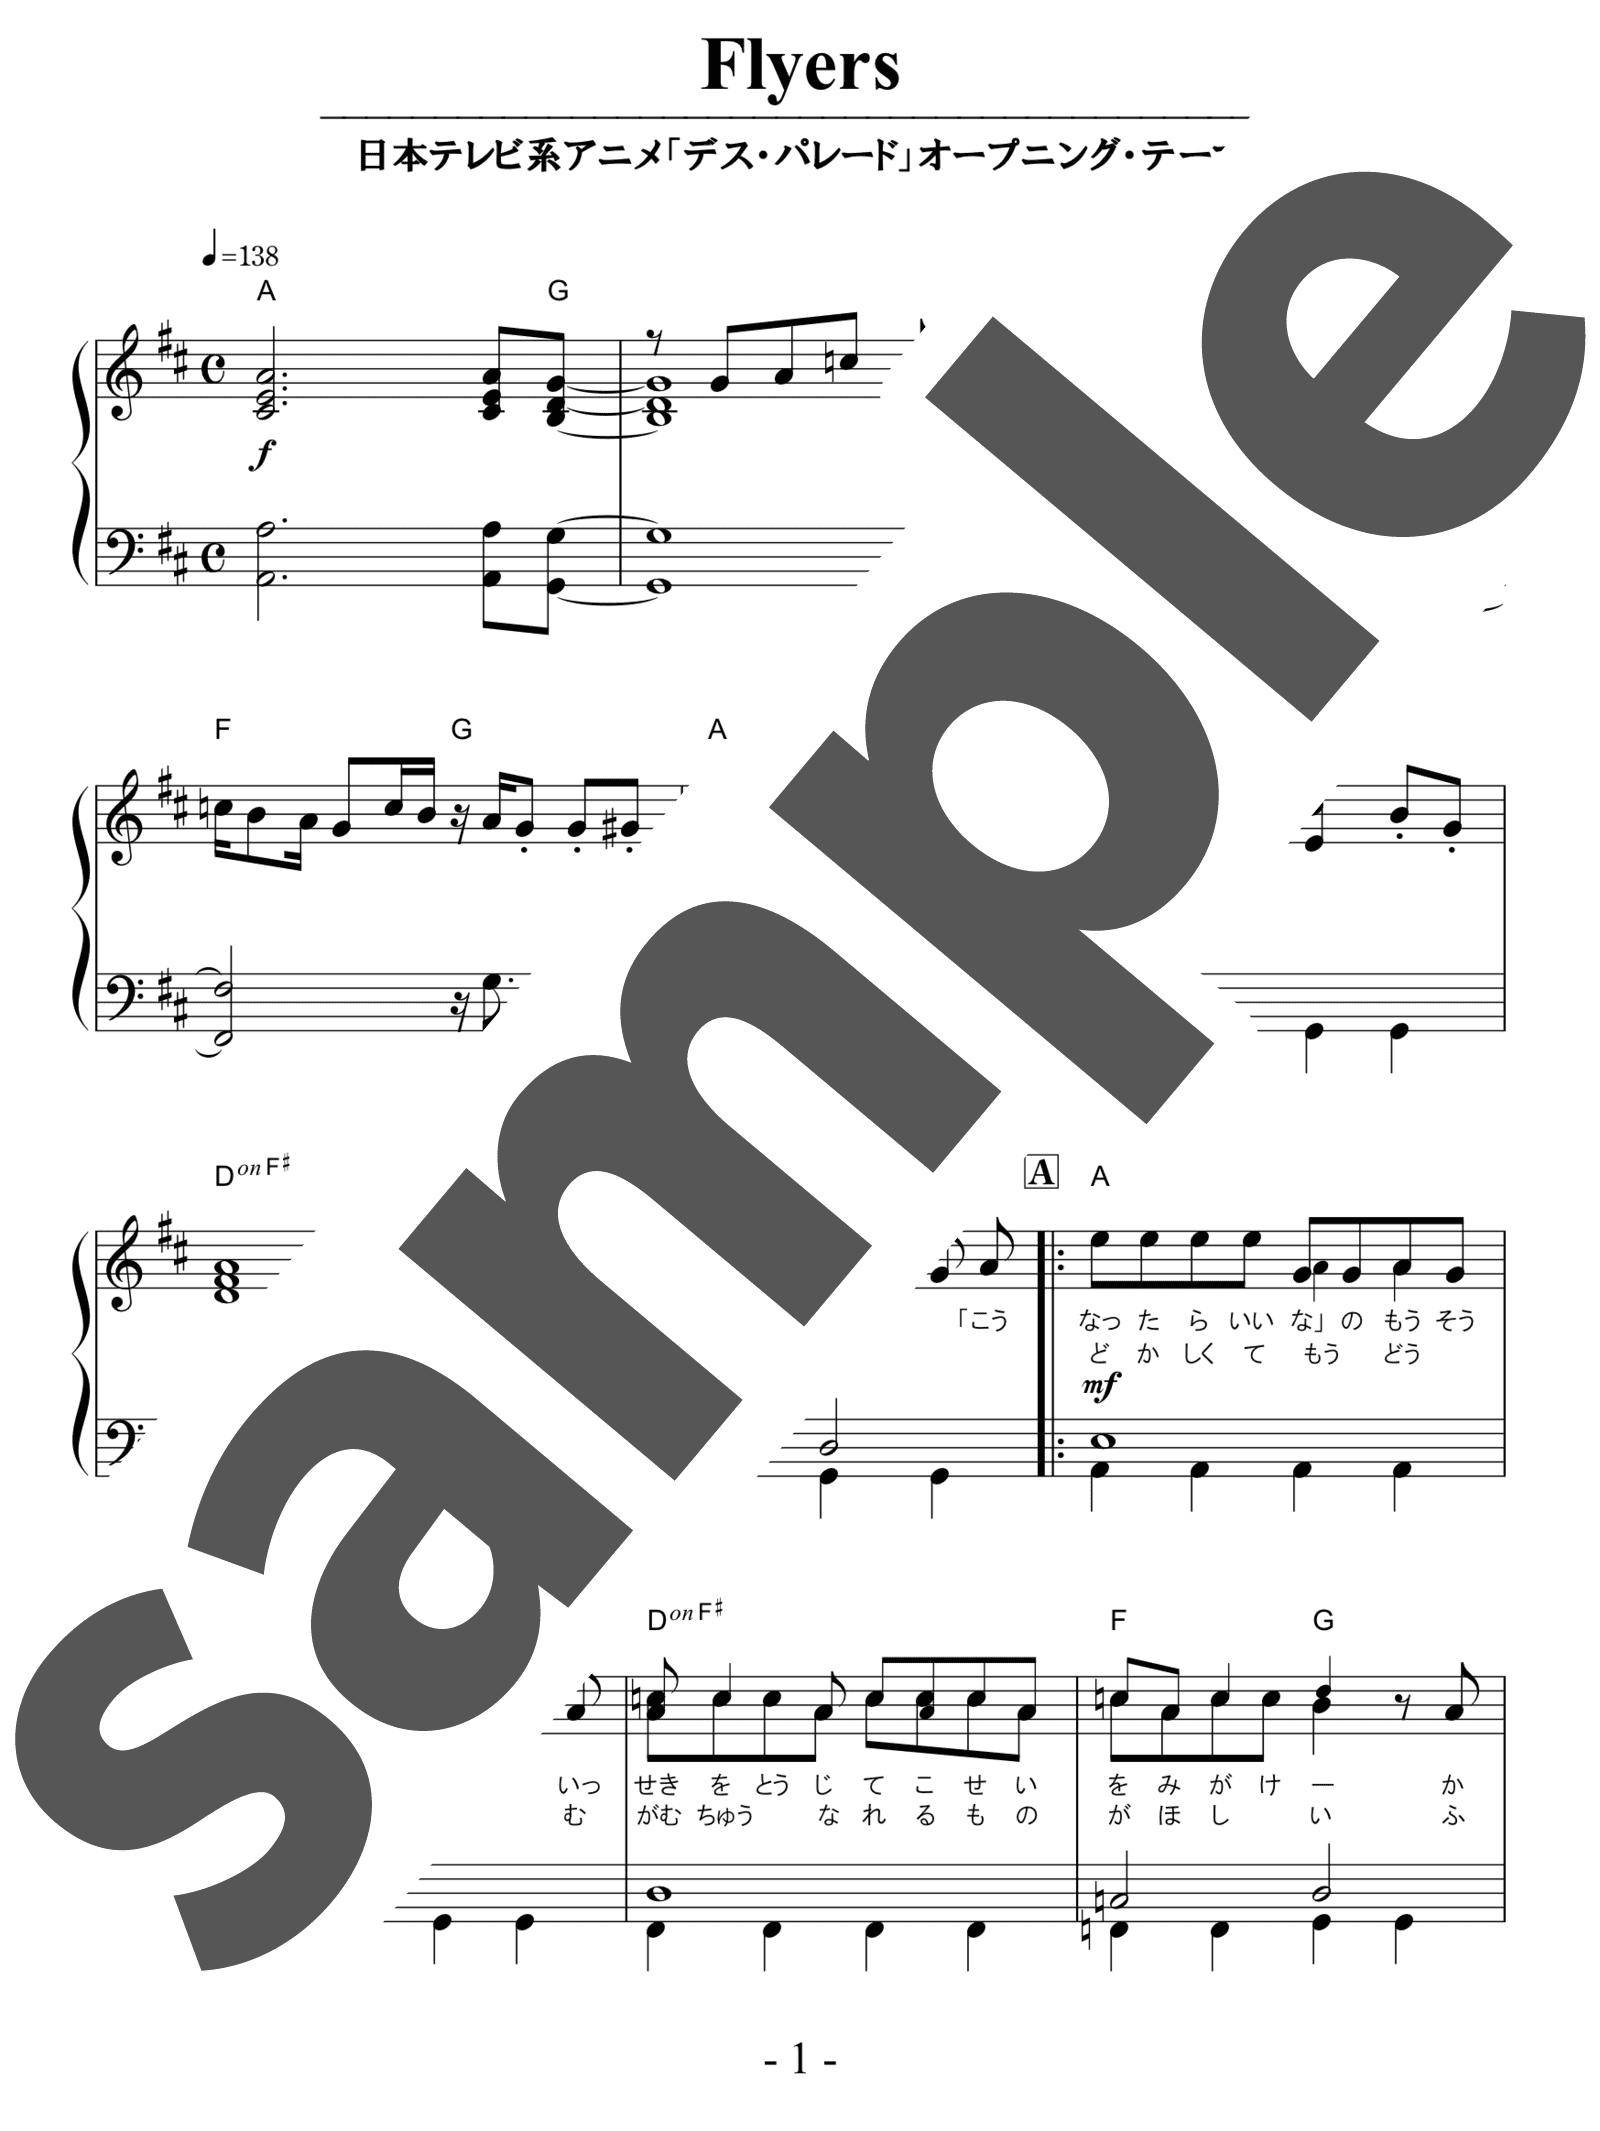 「Flyers」のサンプル楽譜